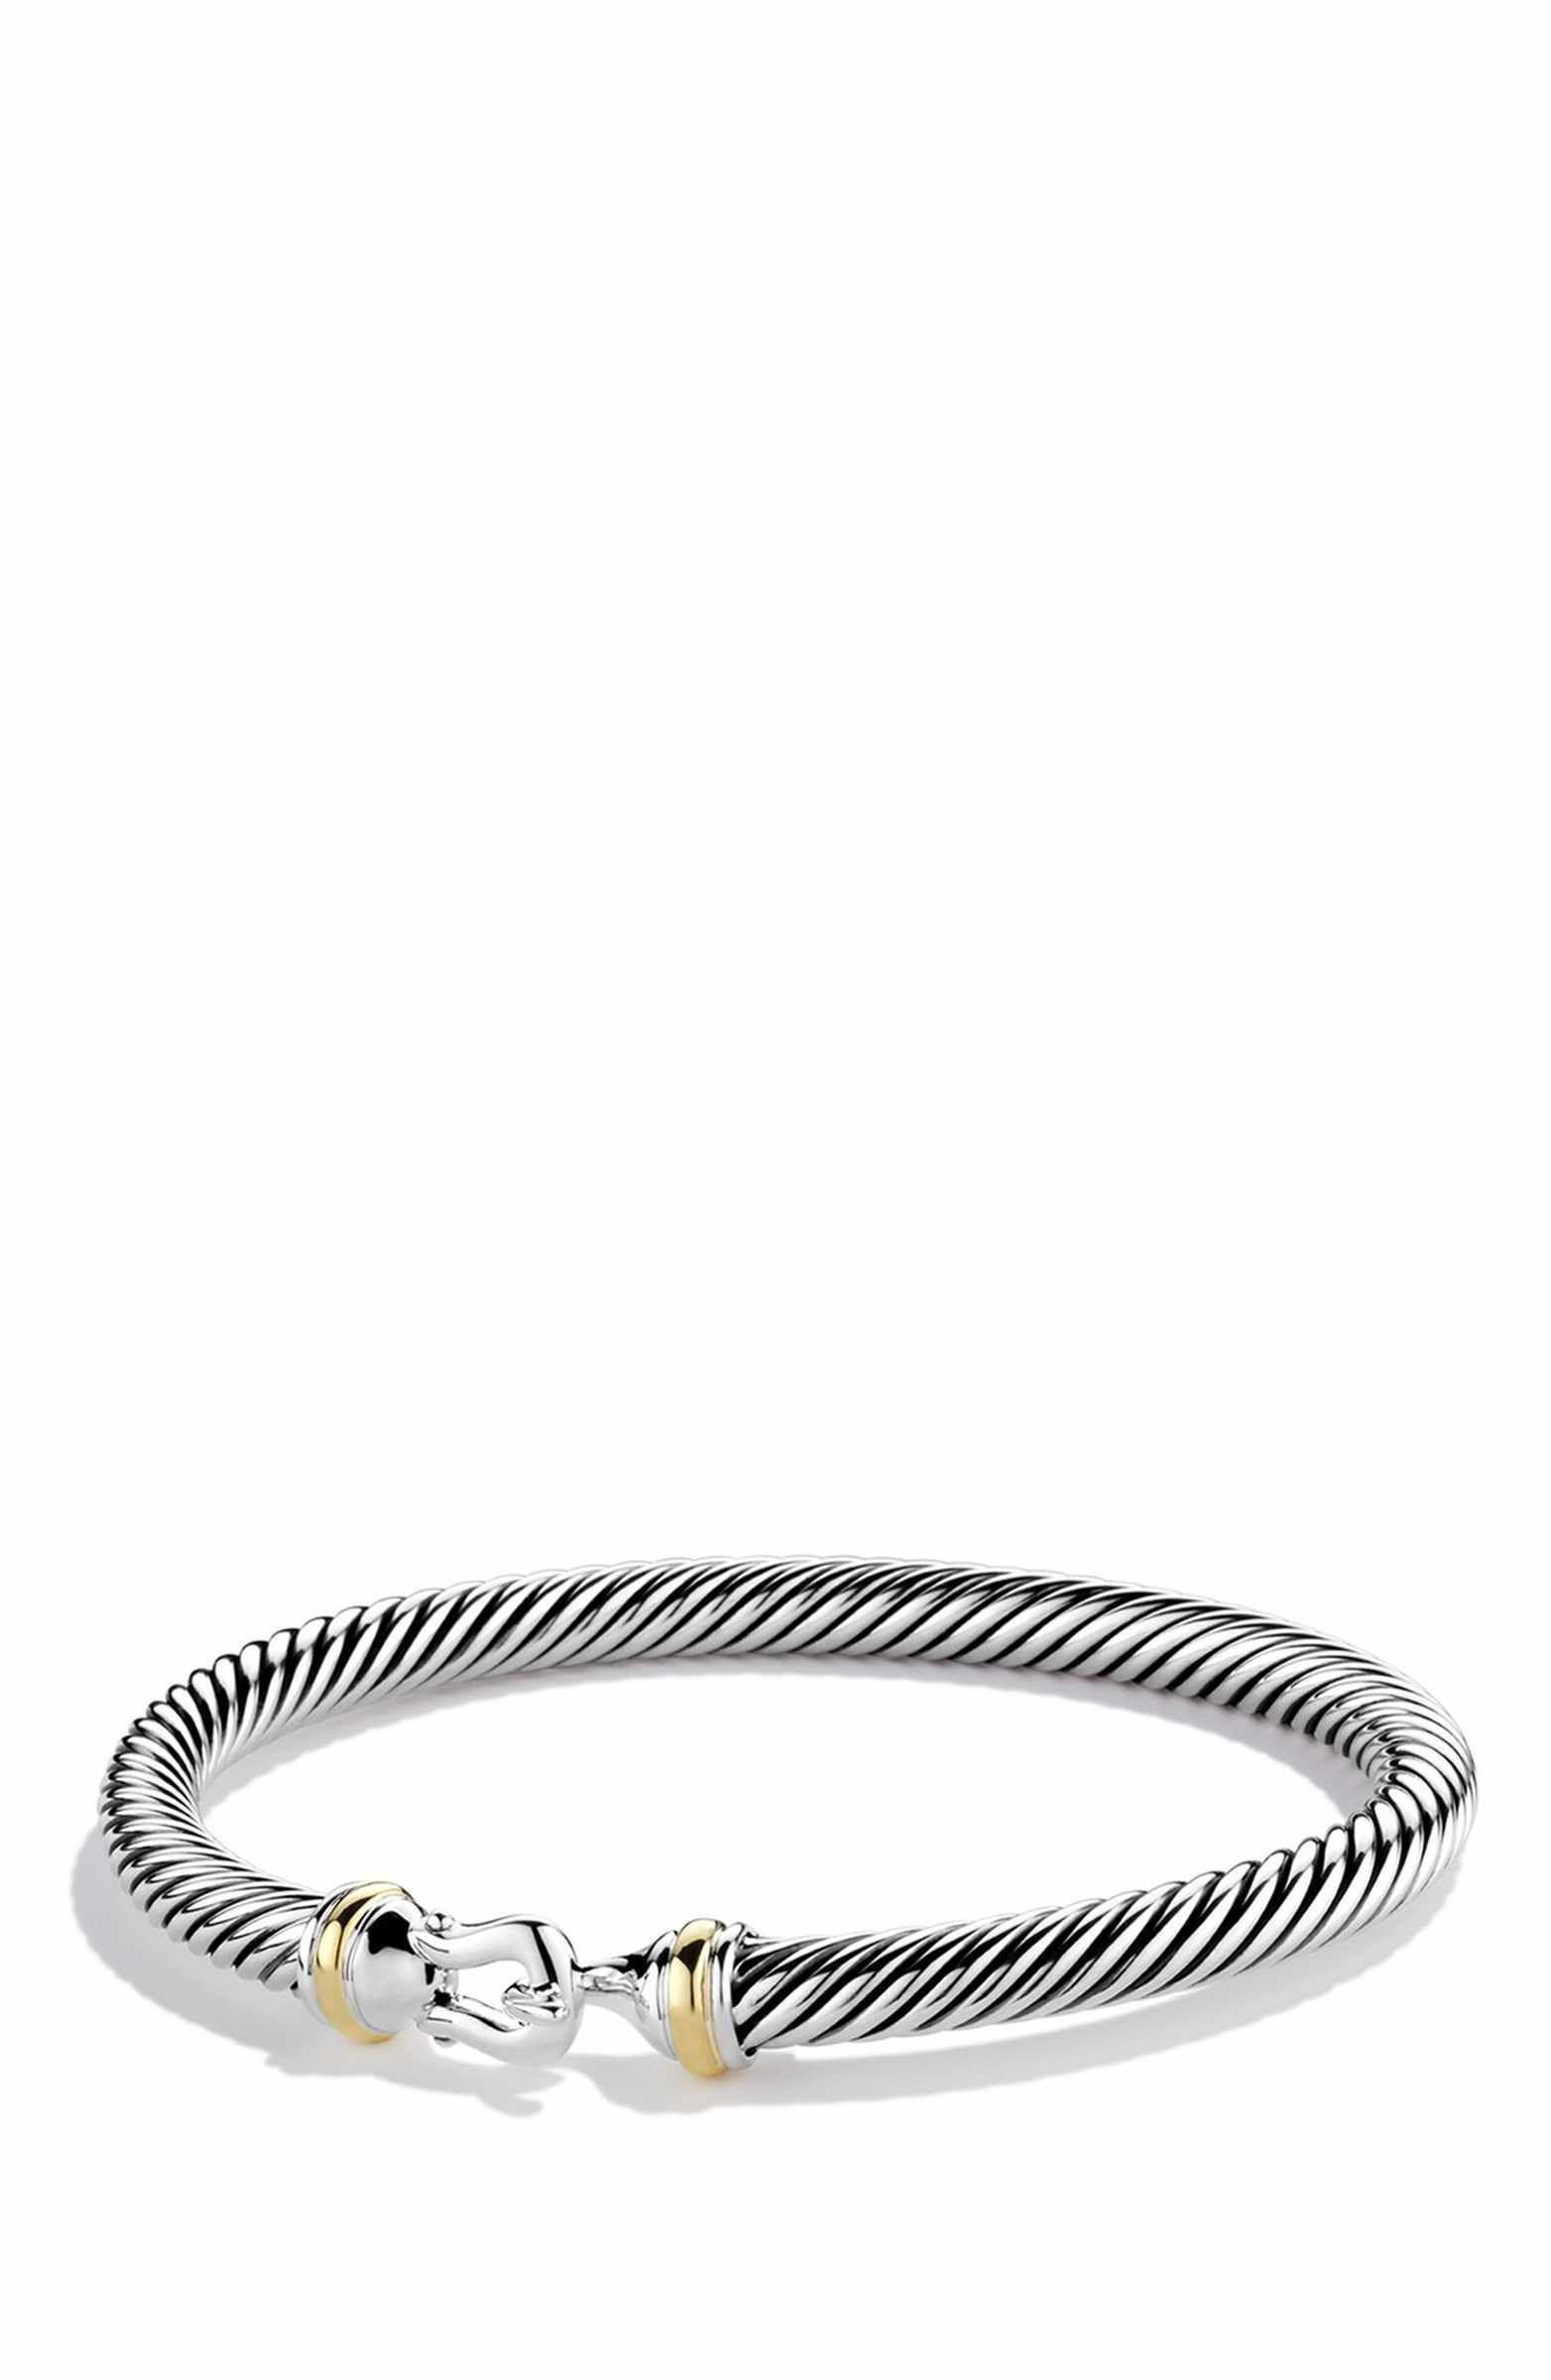 Main Image David Yurman Cable Buckle Bracelet Sterlingsilverdavidyurman